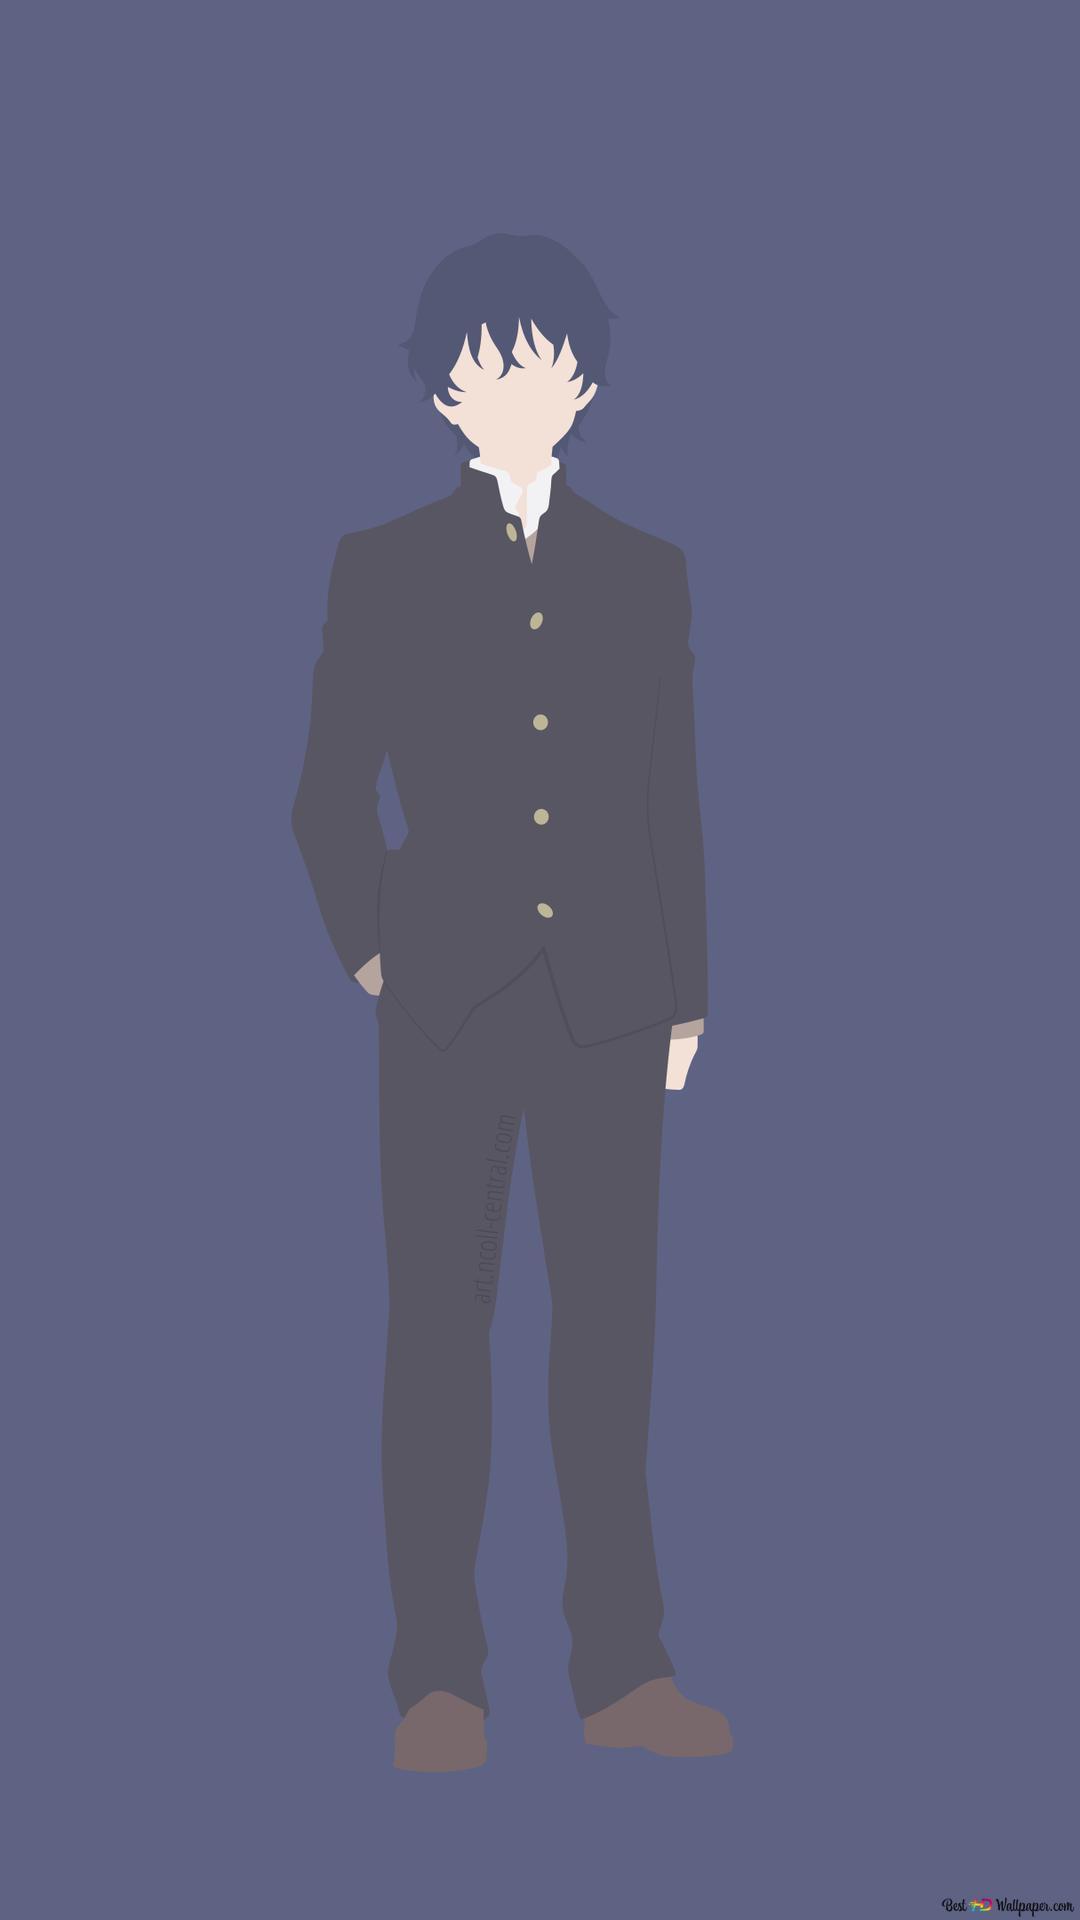 Eita Izumi In Just Because Hd Wallpaper Download